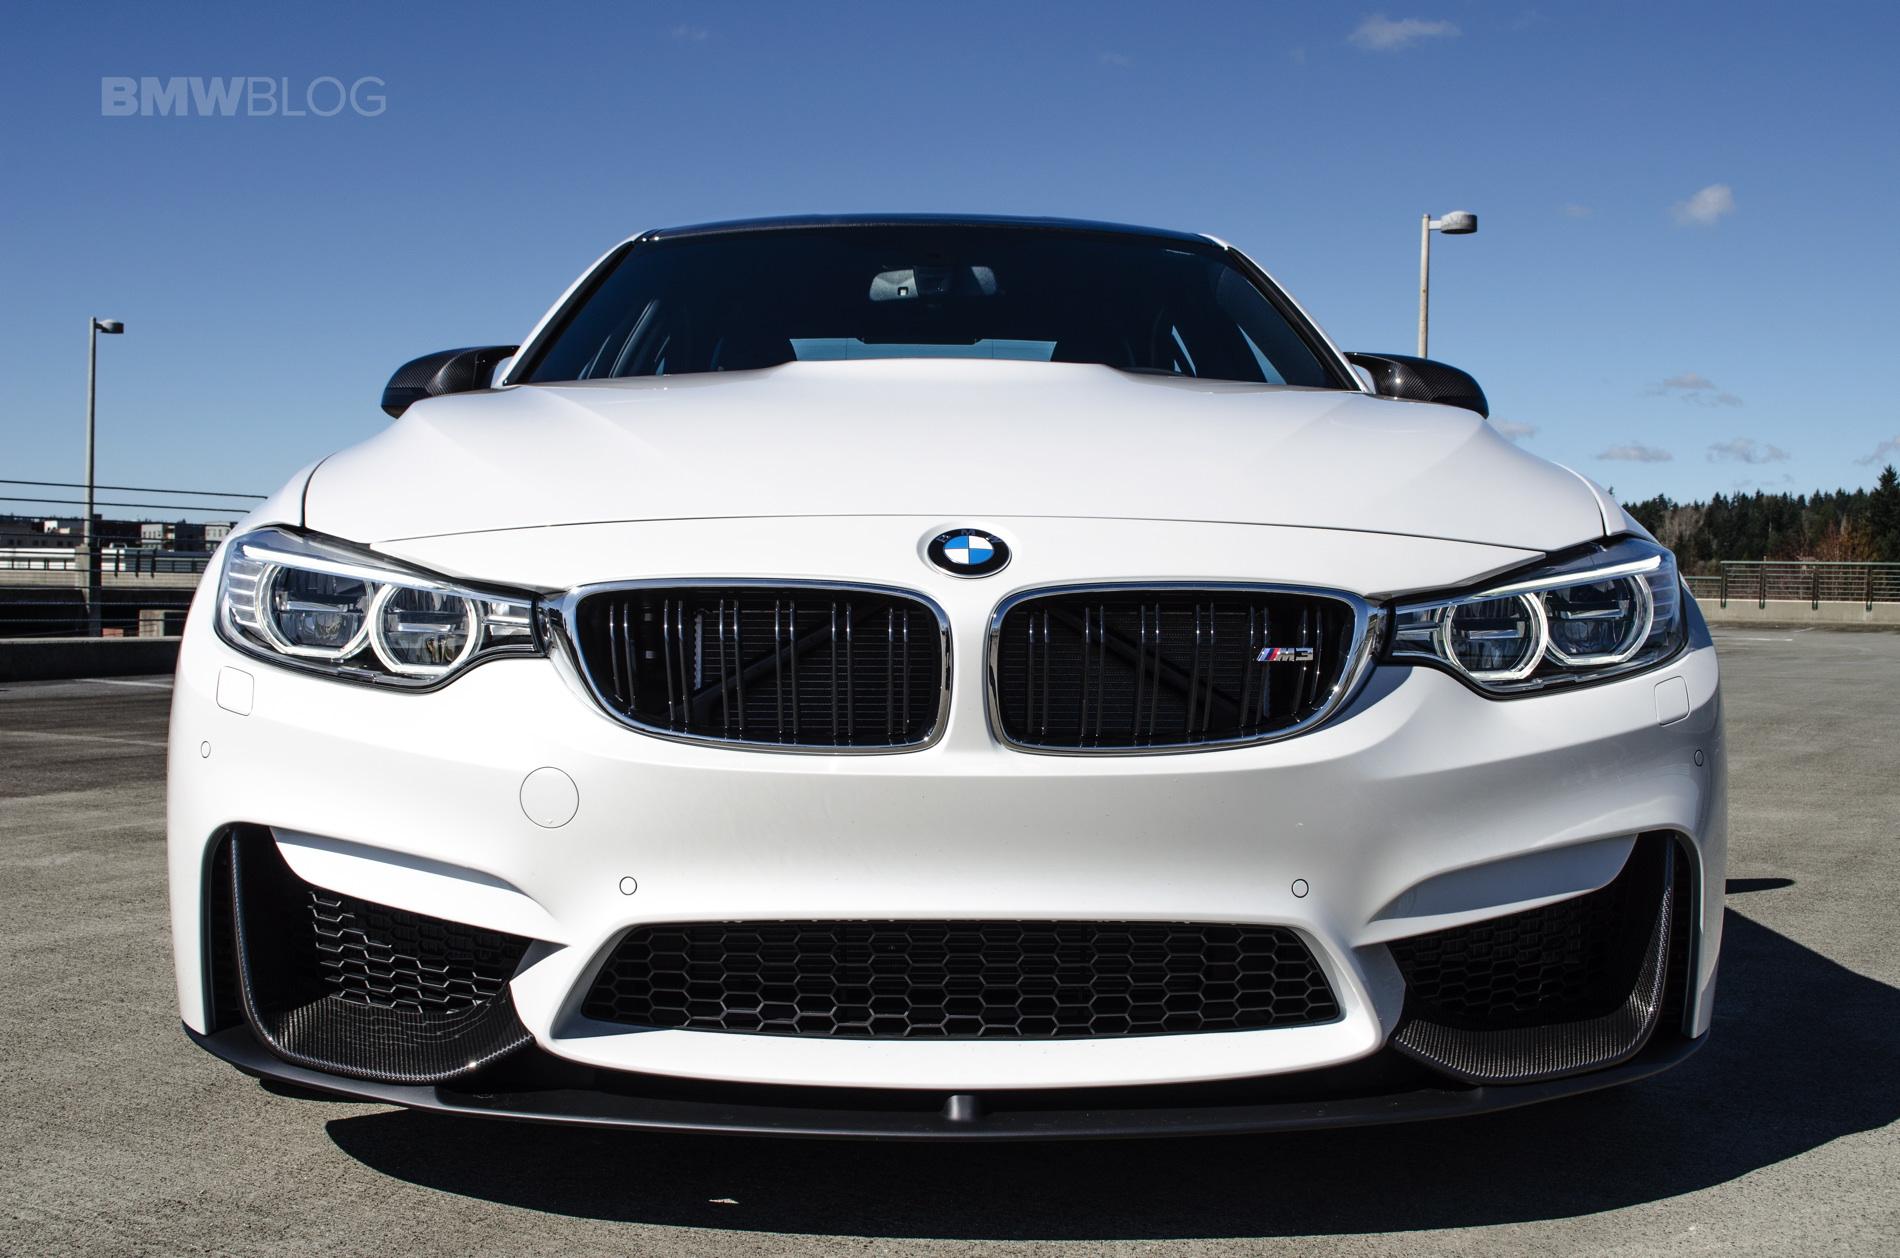 BMW F80 M3 long term review 09